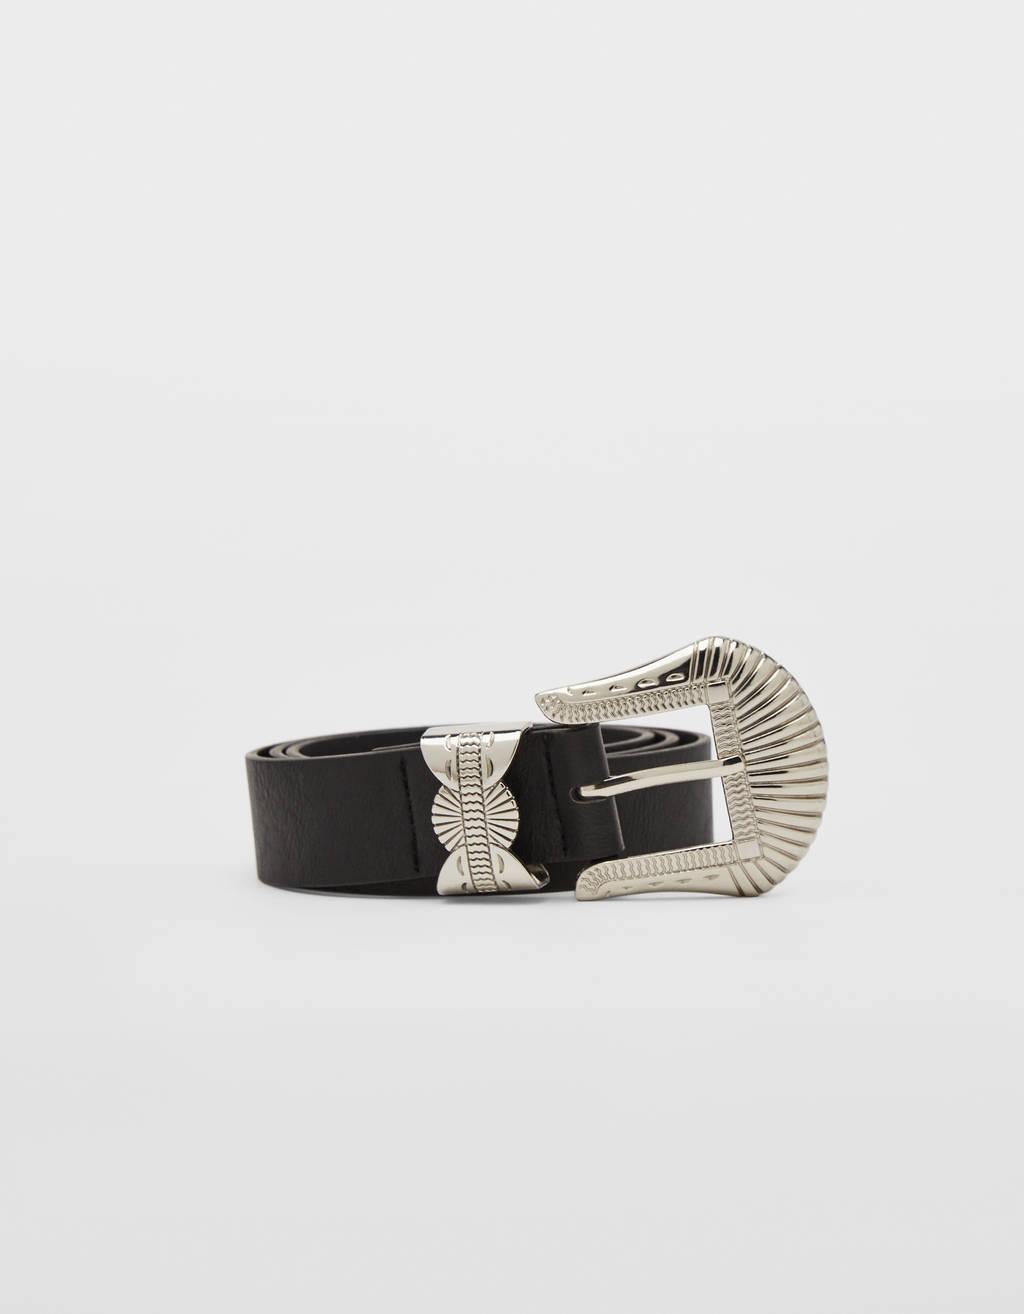 Cowboy belt with metal buckle